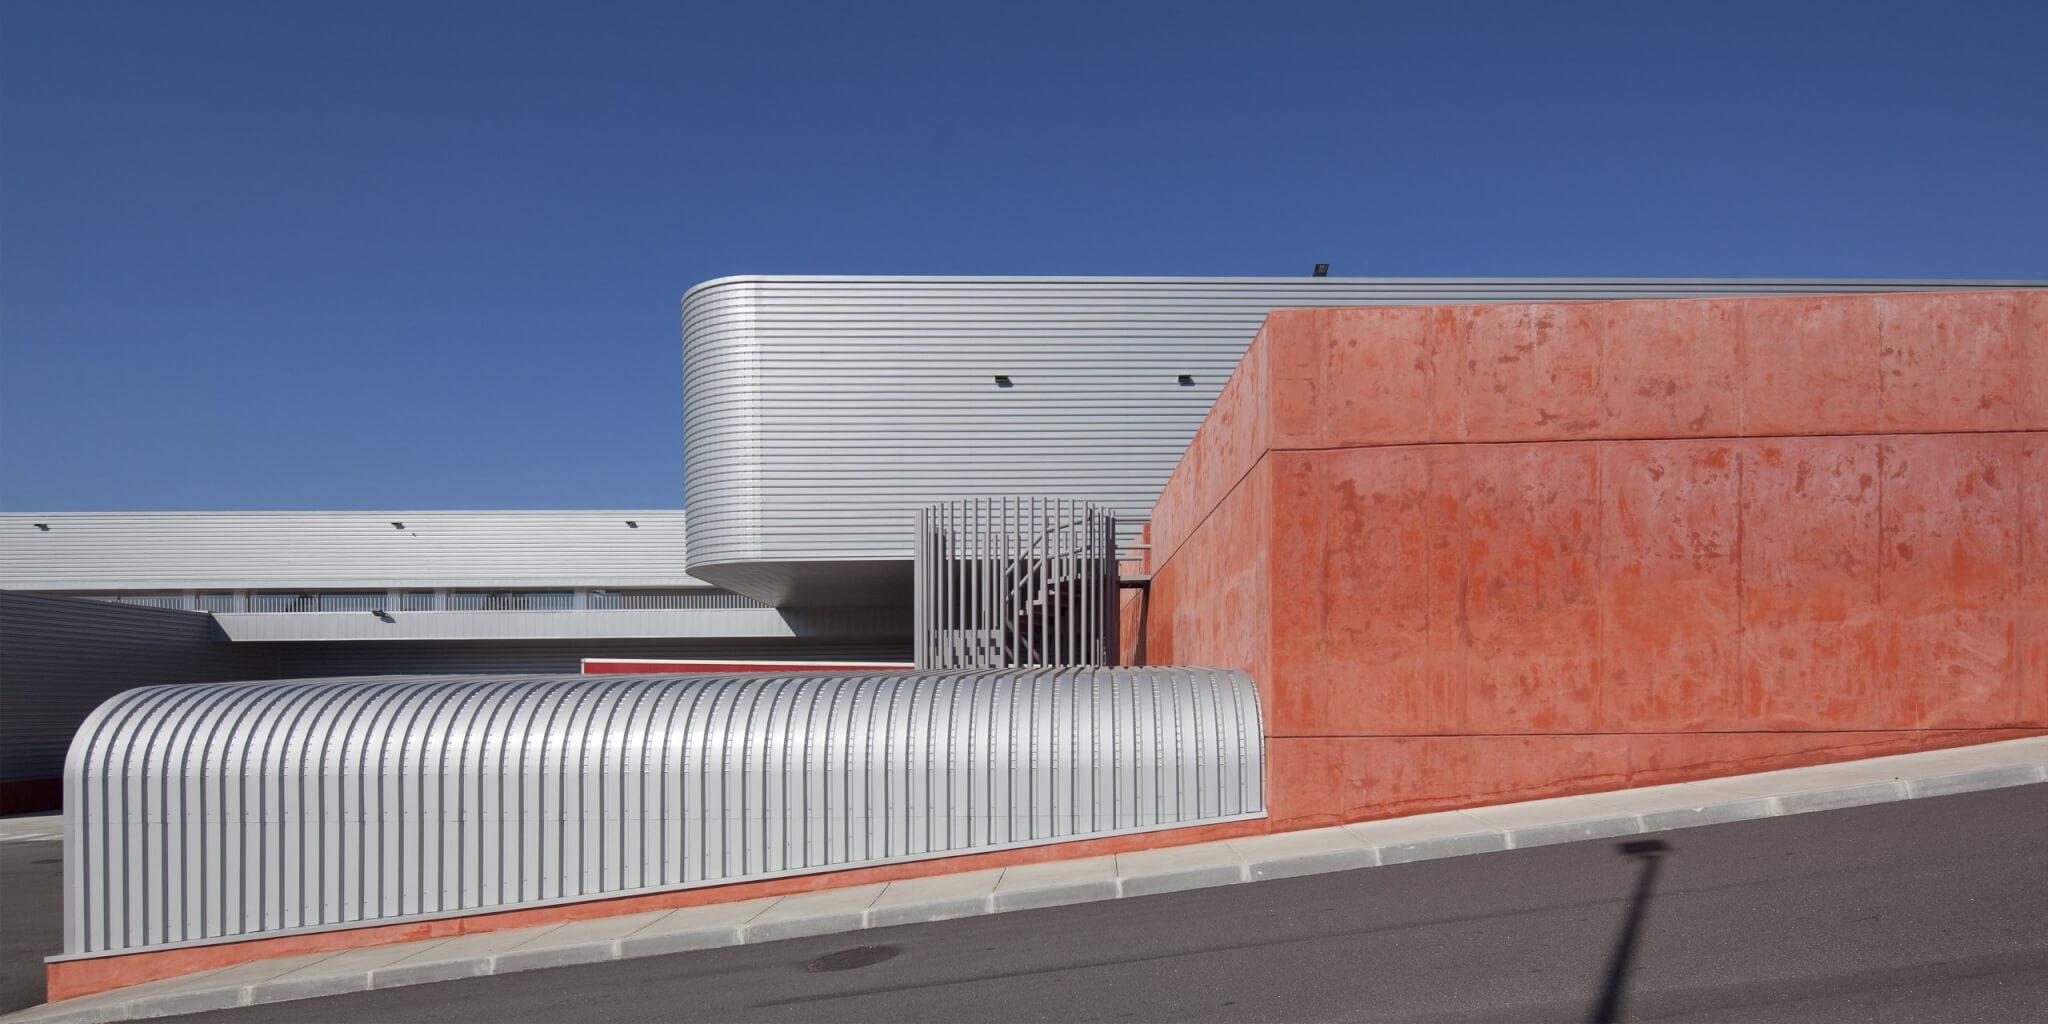 Fábrica de Conservas Ramirez